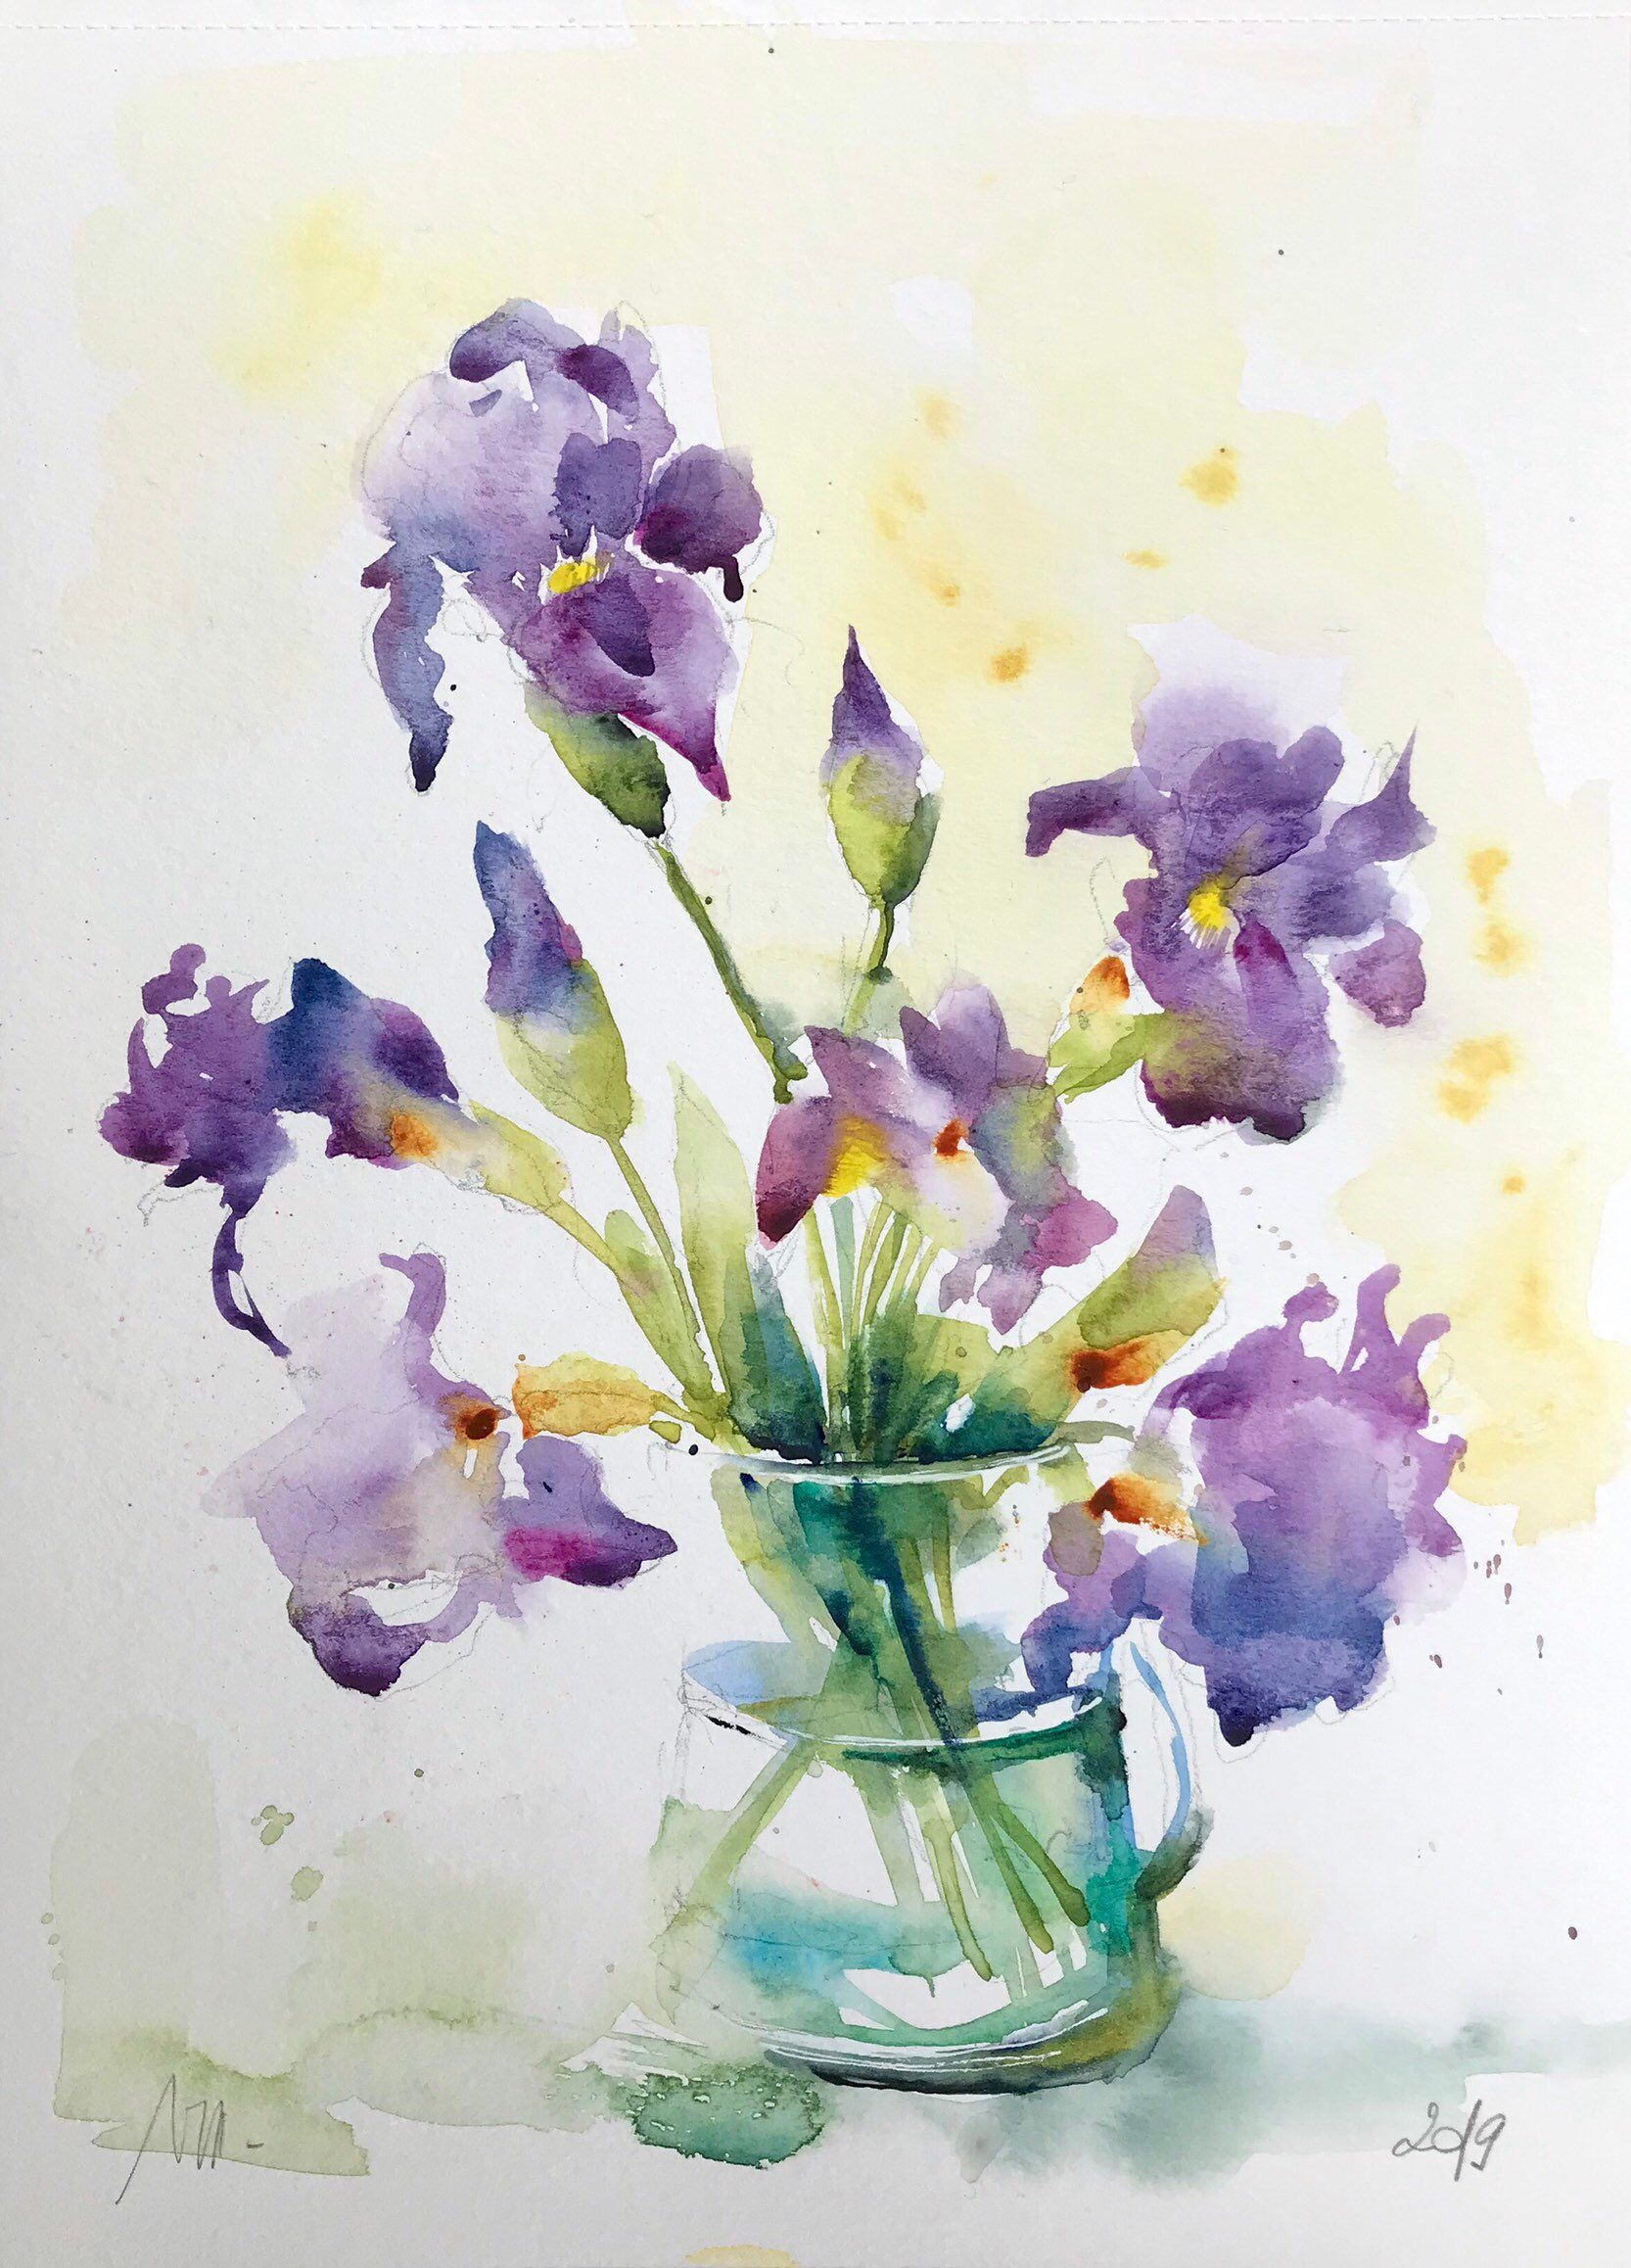 Watercolor Iris Peinture Fleurs Aquarelle Abstraite Aquarelle